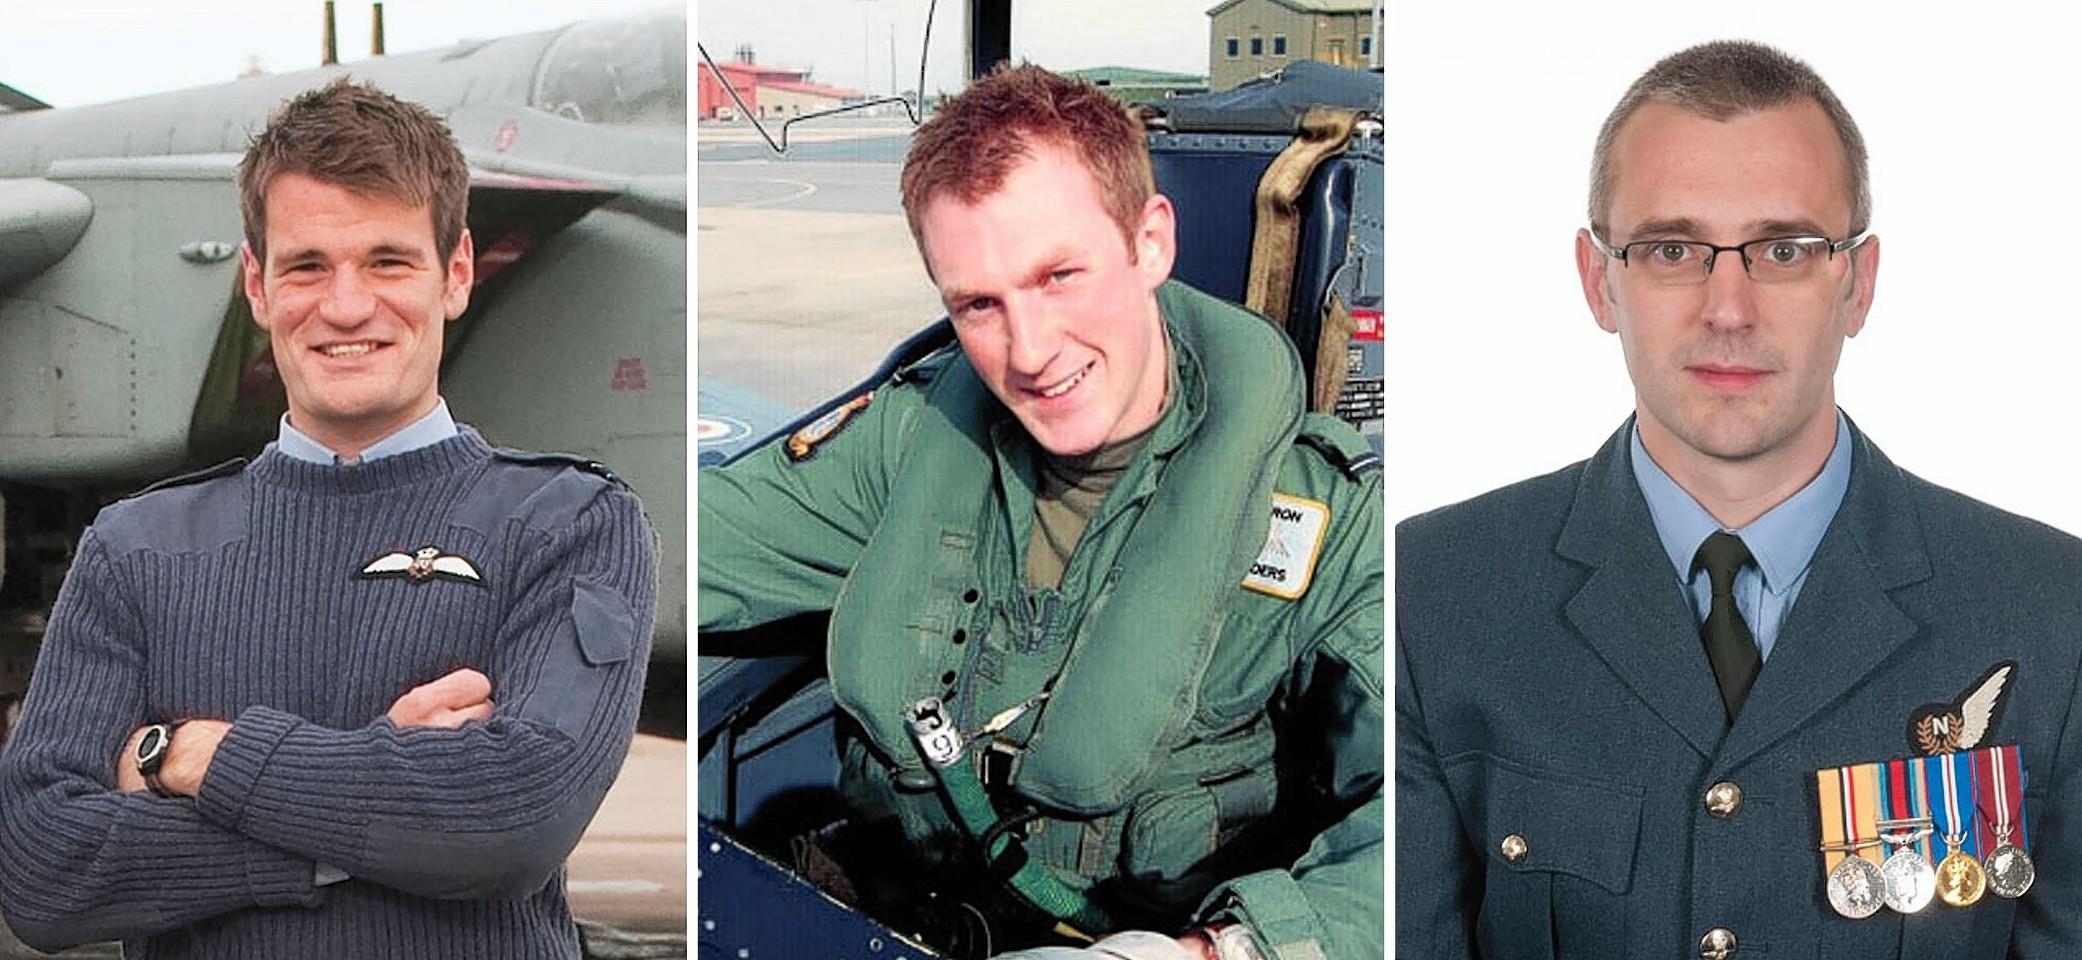 Flight Lieutenant Hywel Poole (left), Flight Lieutenant Adam Sanders (centre) and Squadron Leader Samuel Bailey were killed in the crash